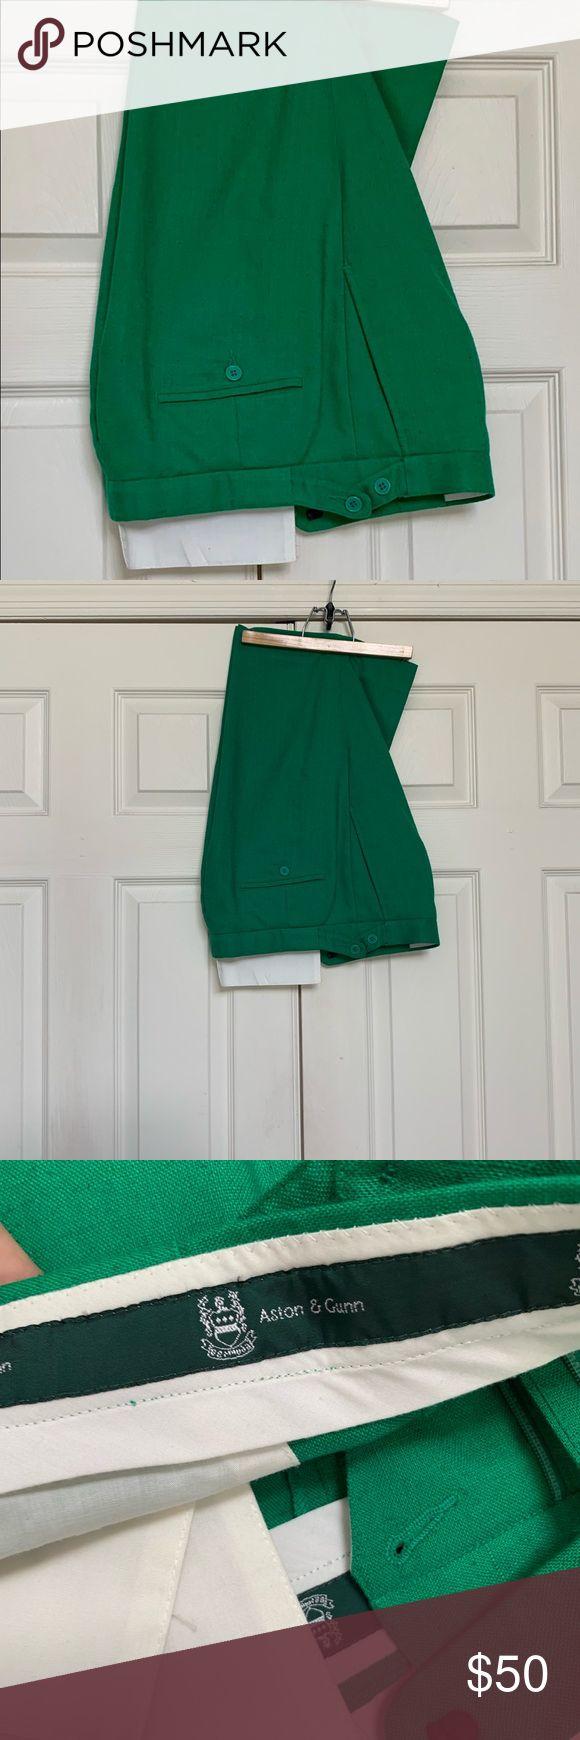 Aston & Gunn Bermuda Shorts in 2020 Clothing store